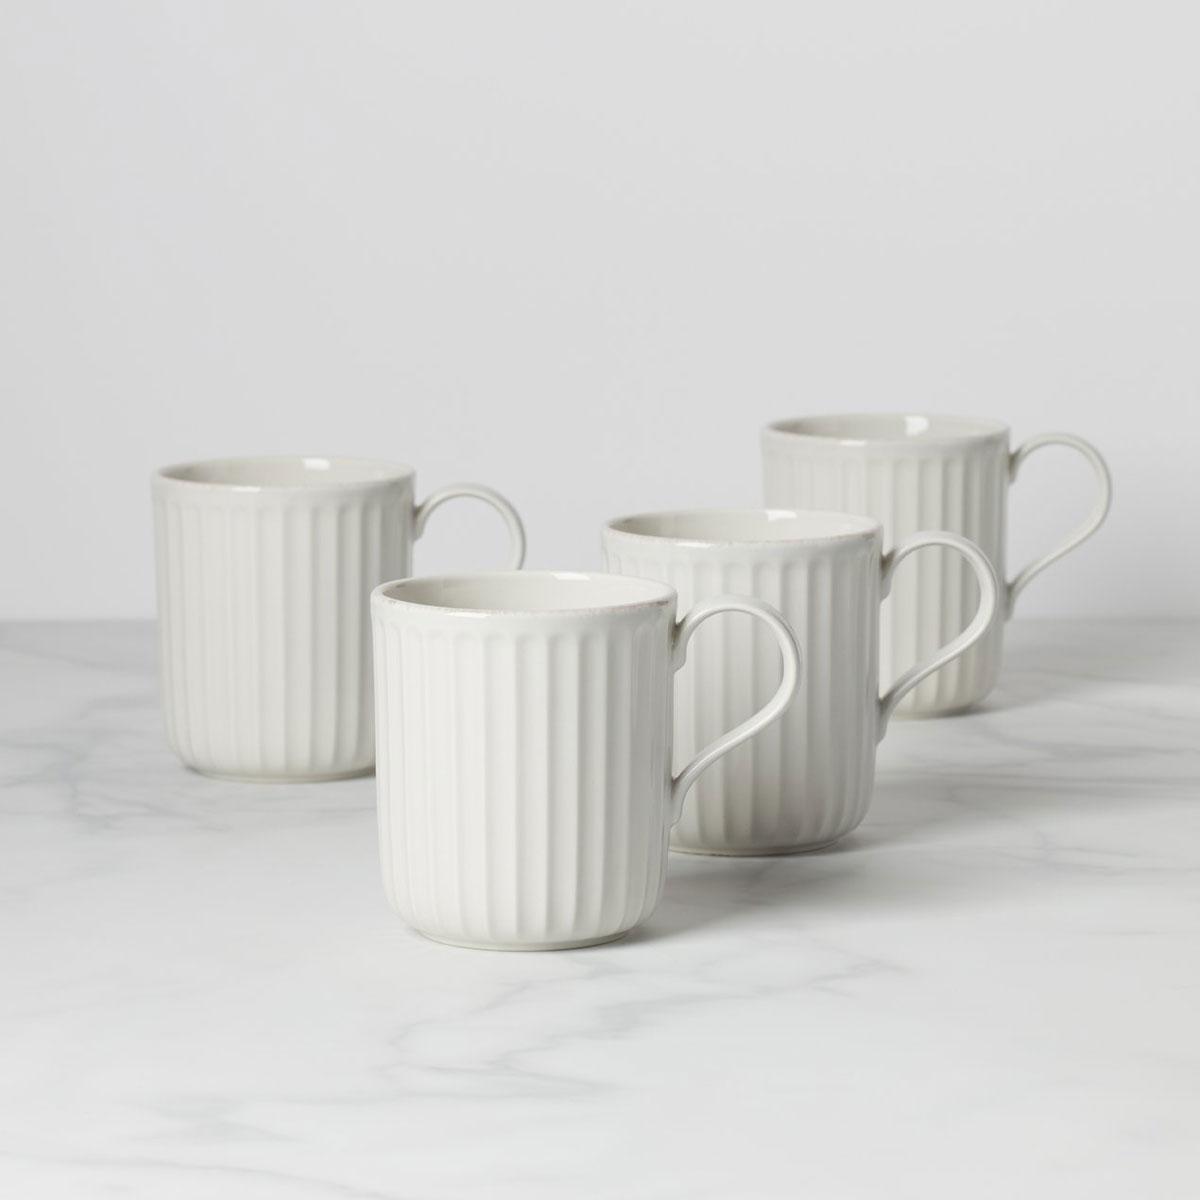 Lenox French Perle Scallop 4 Piece Mug Set